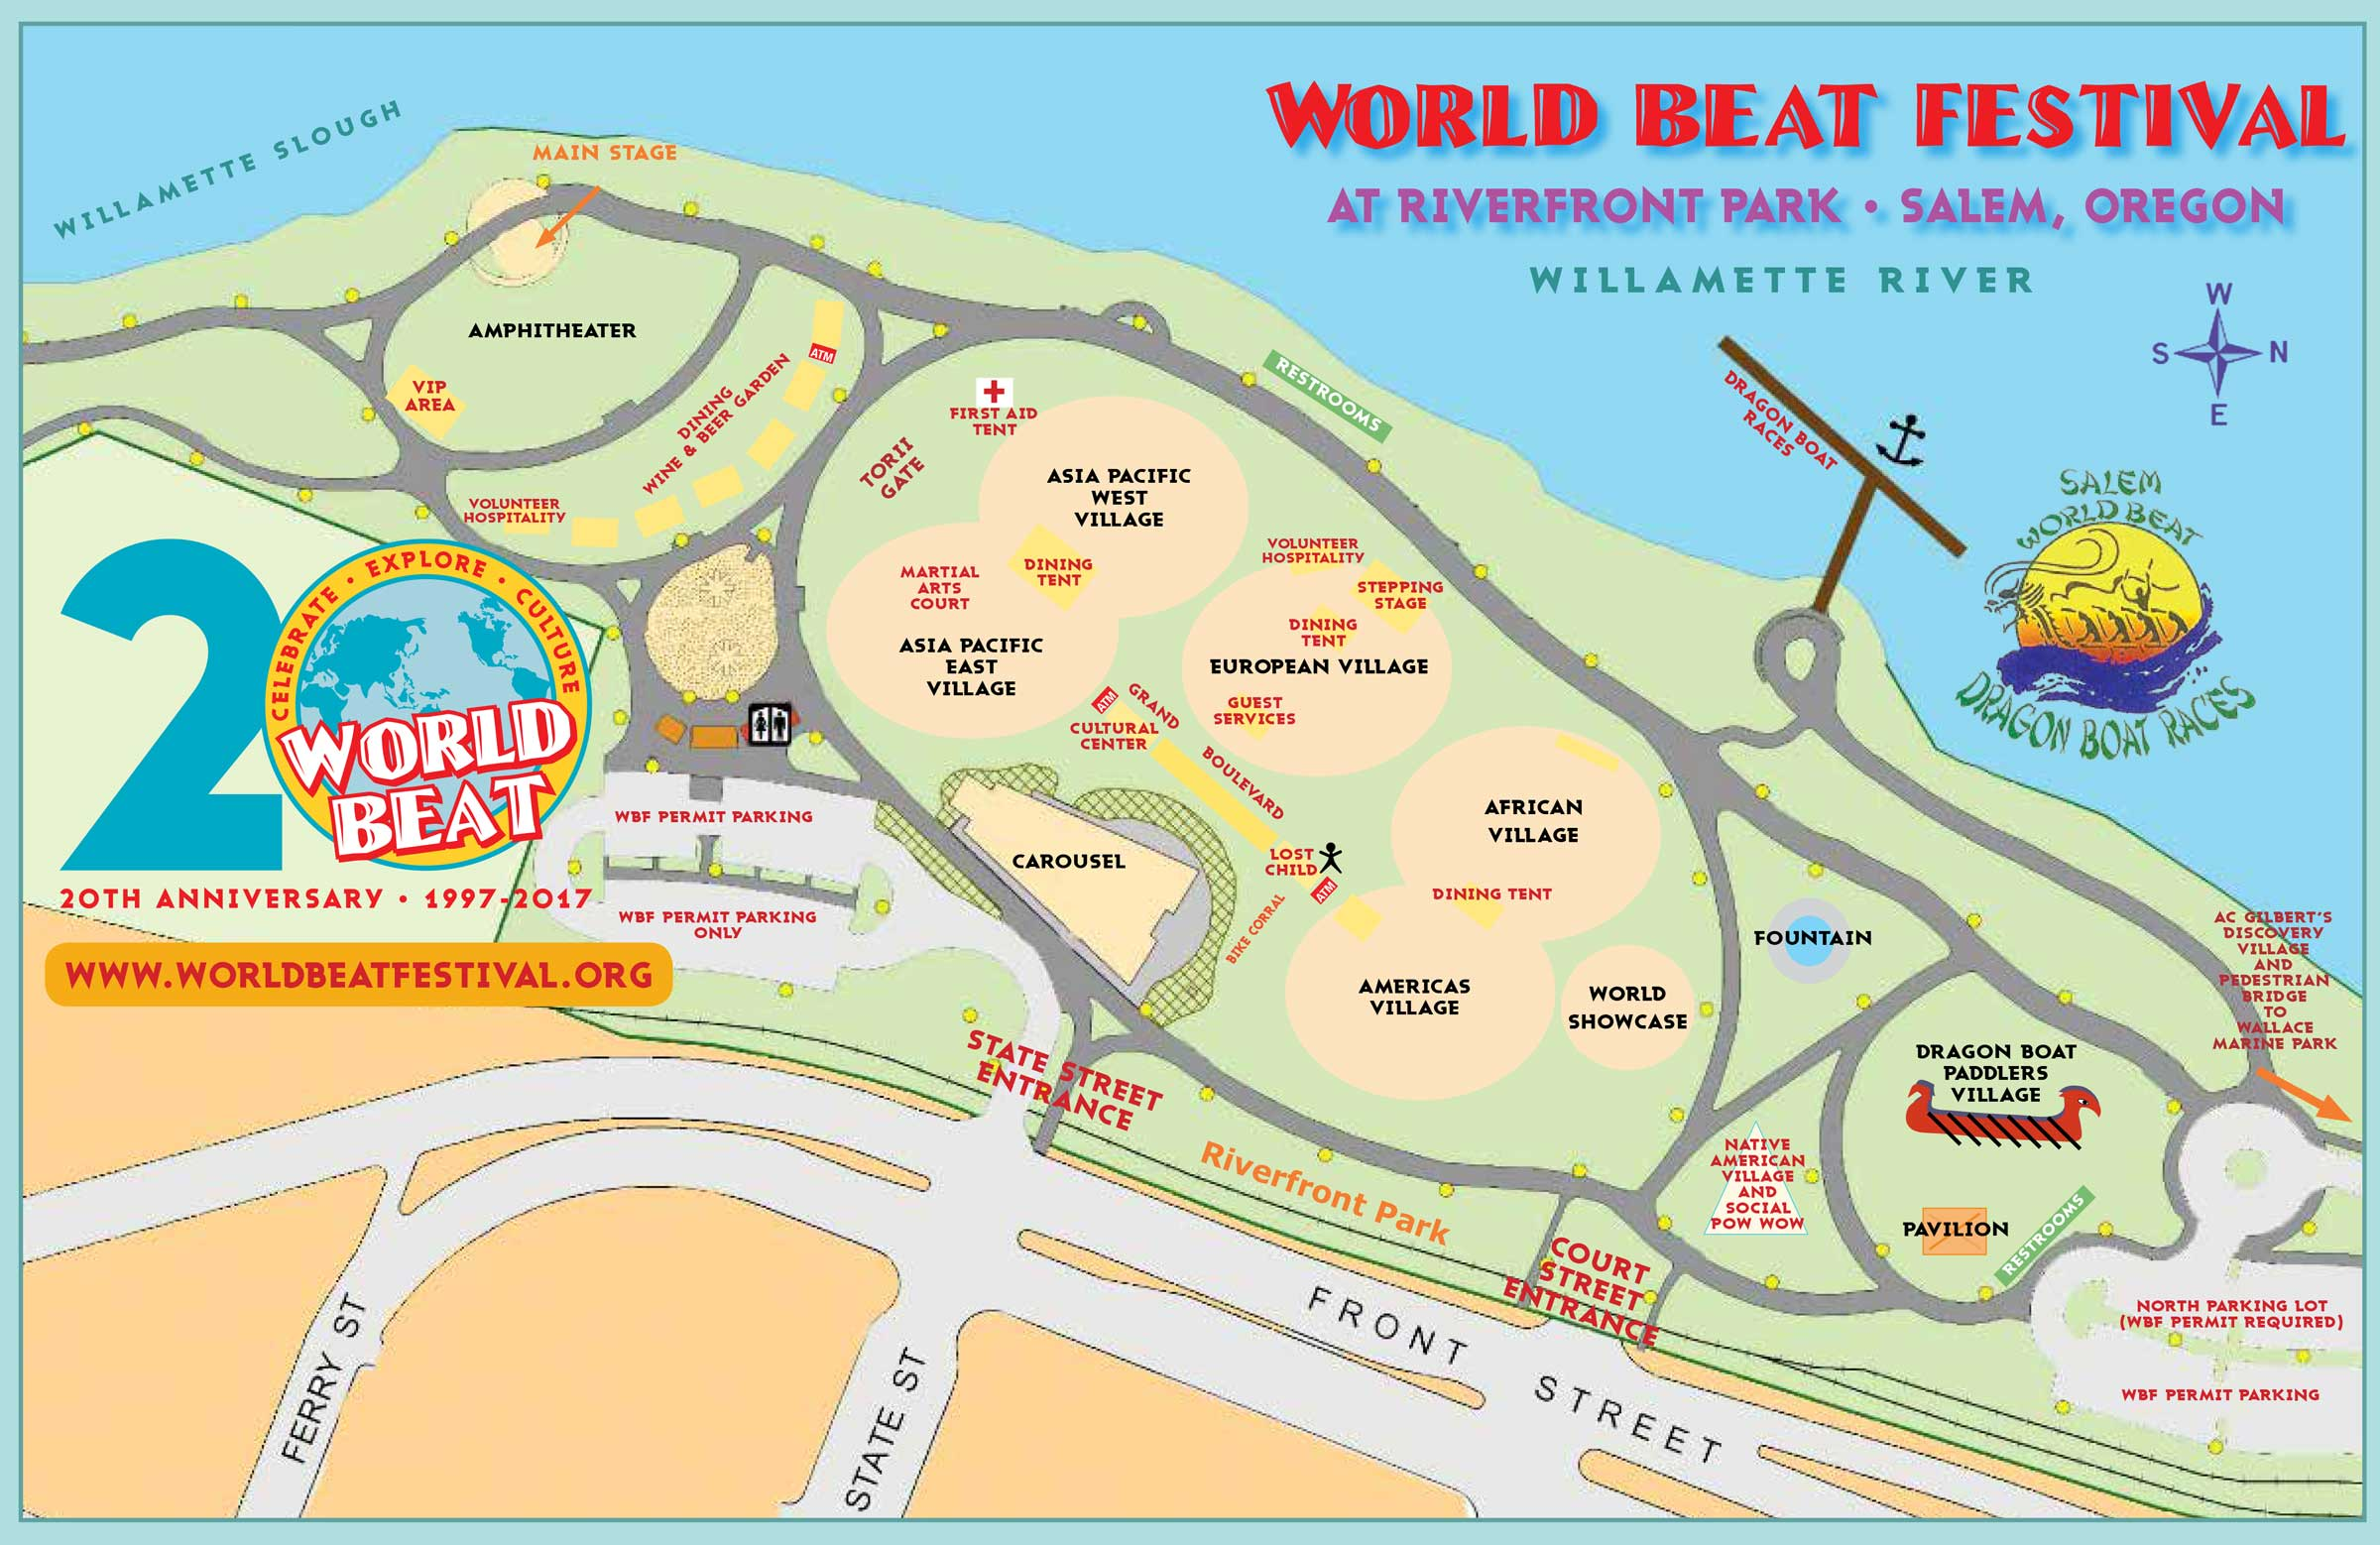 World Music Map - Music Map of the World - Metsker Maps